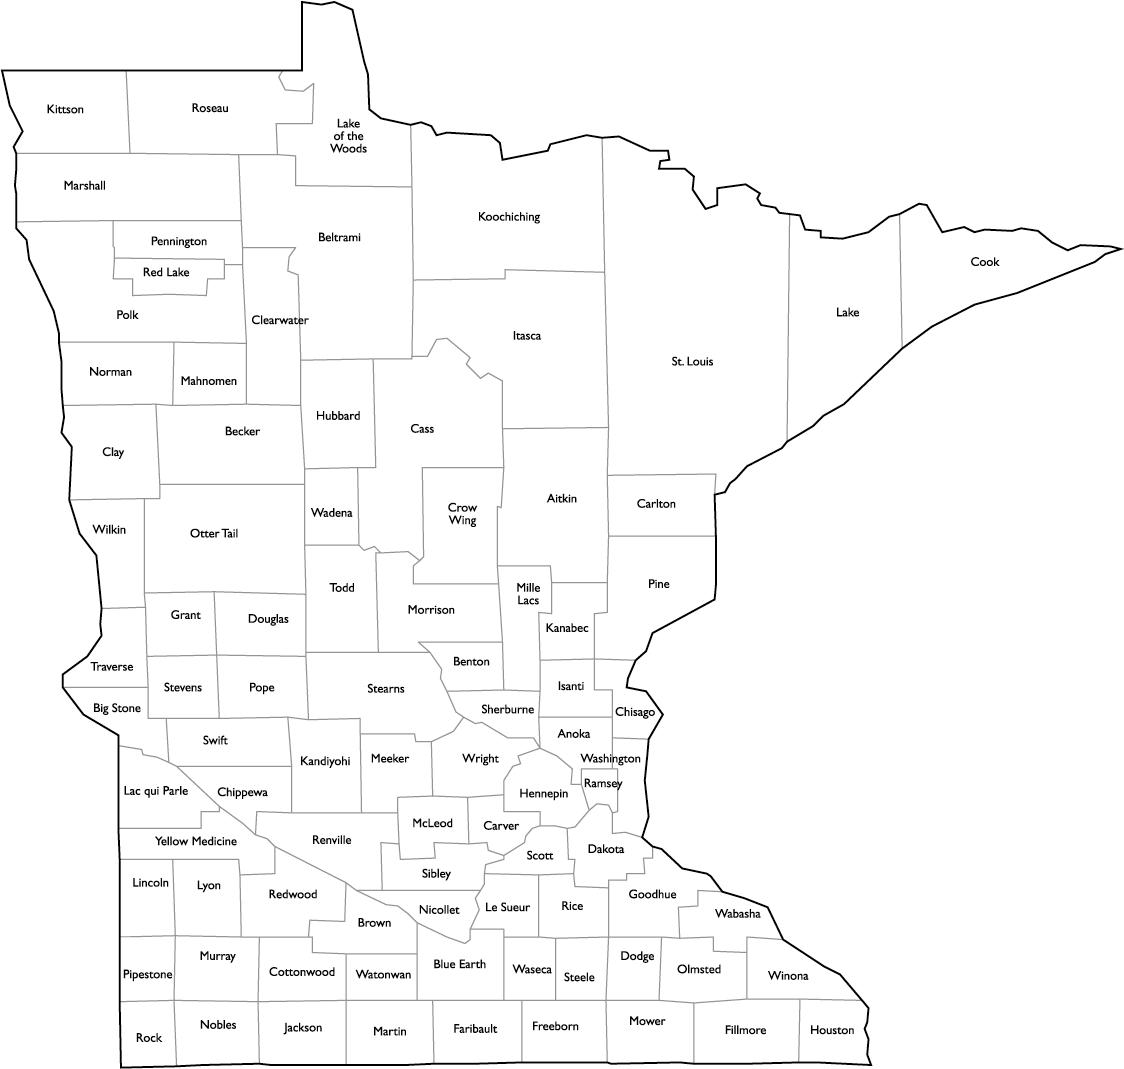 biohazard remediation Minnesota | professional crime scene cleanup | suicide cleanup Minneapolis